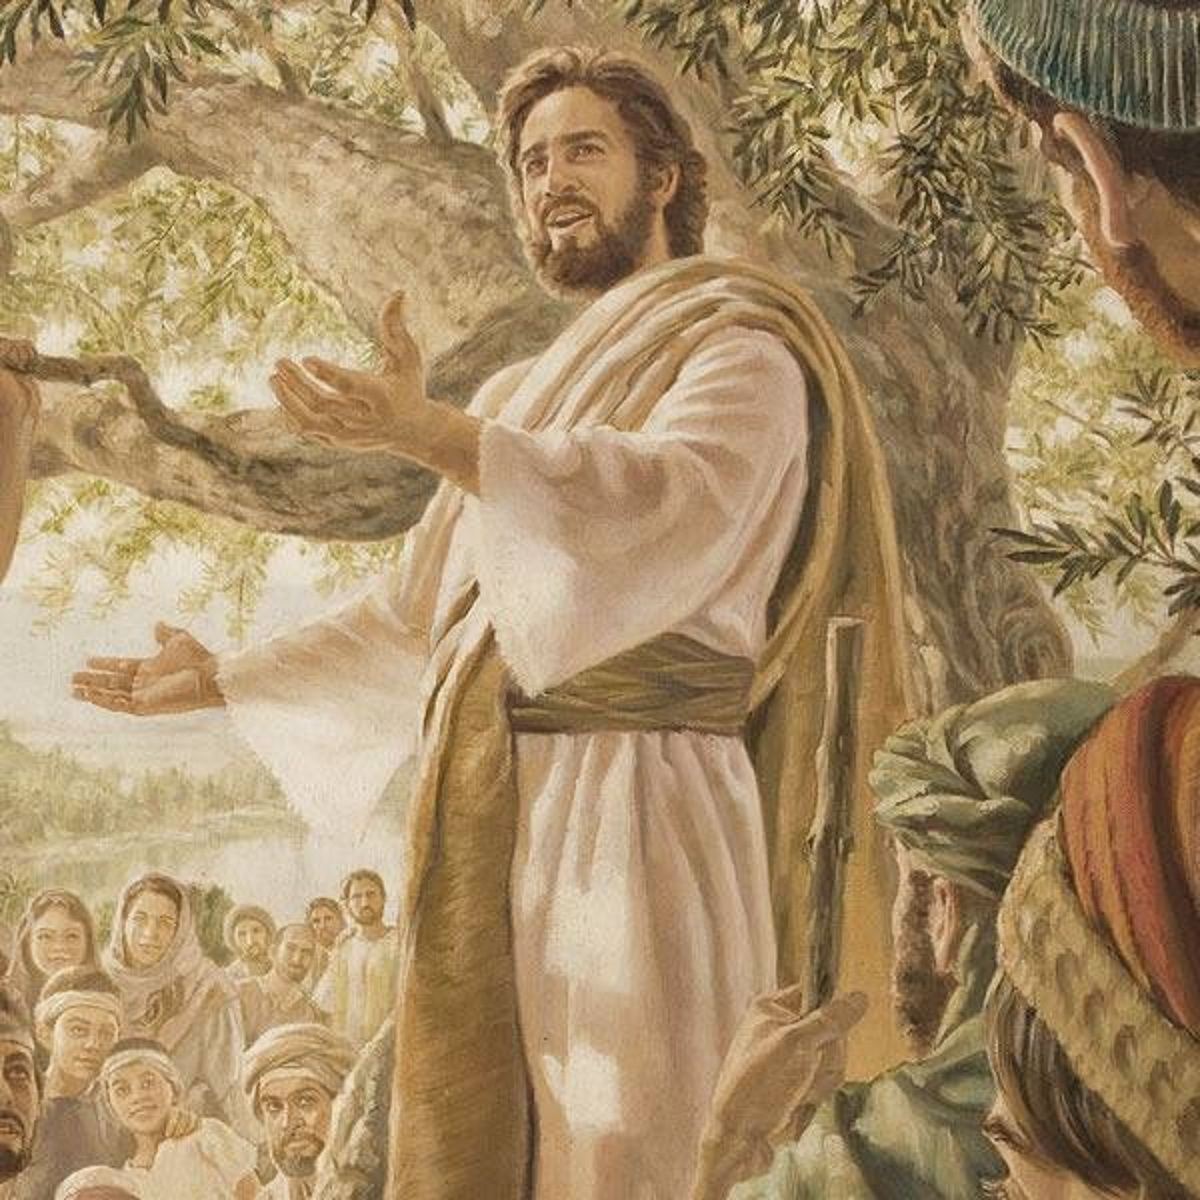 Paroles de Jésus 2016 6.jpg